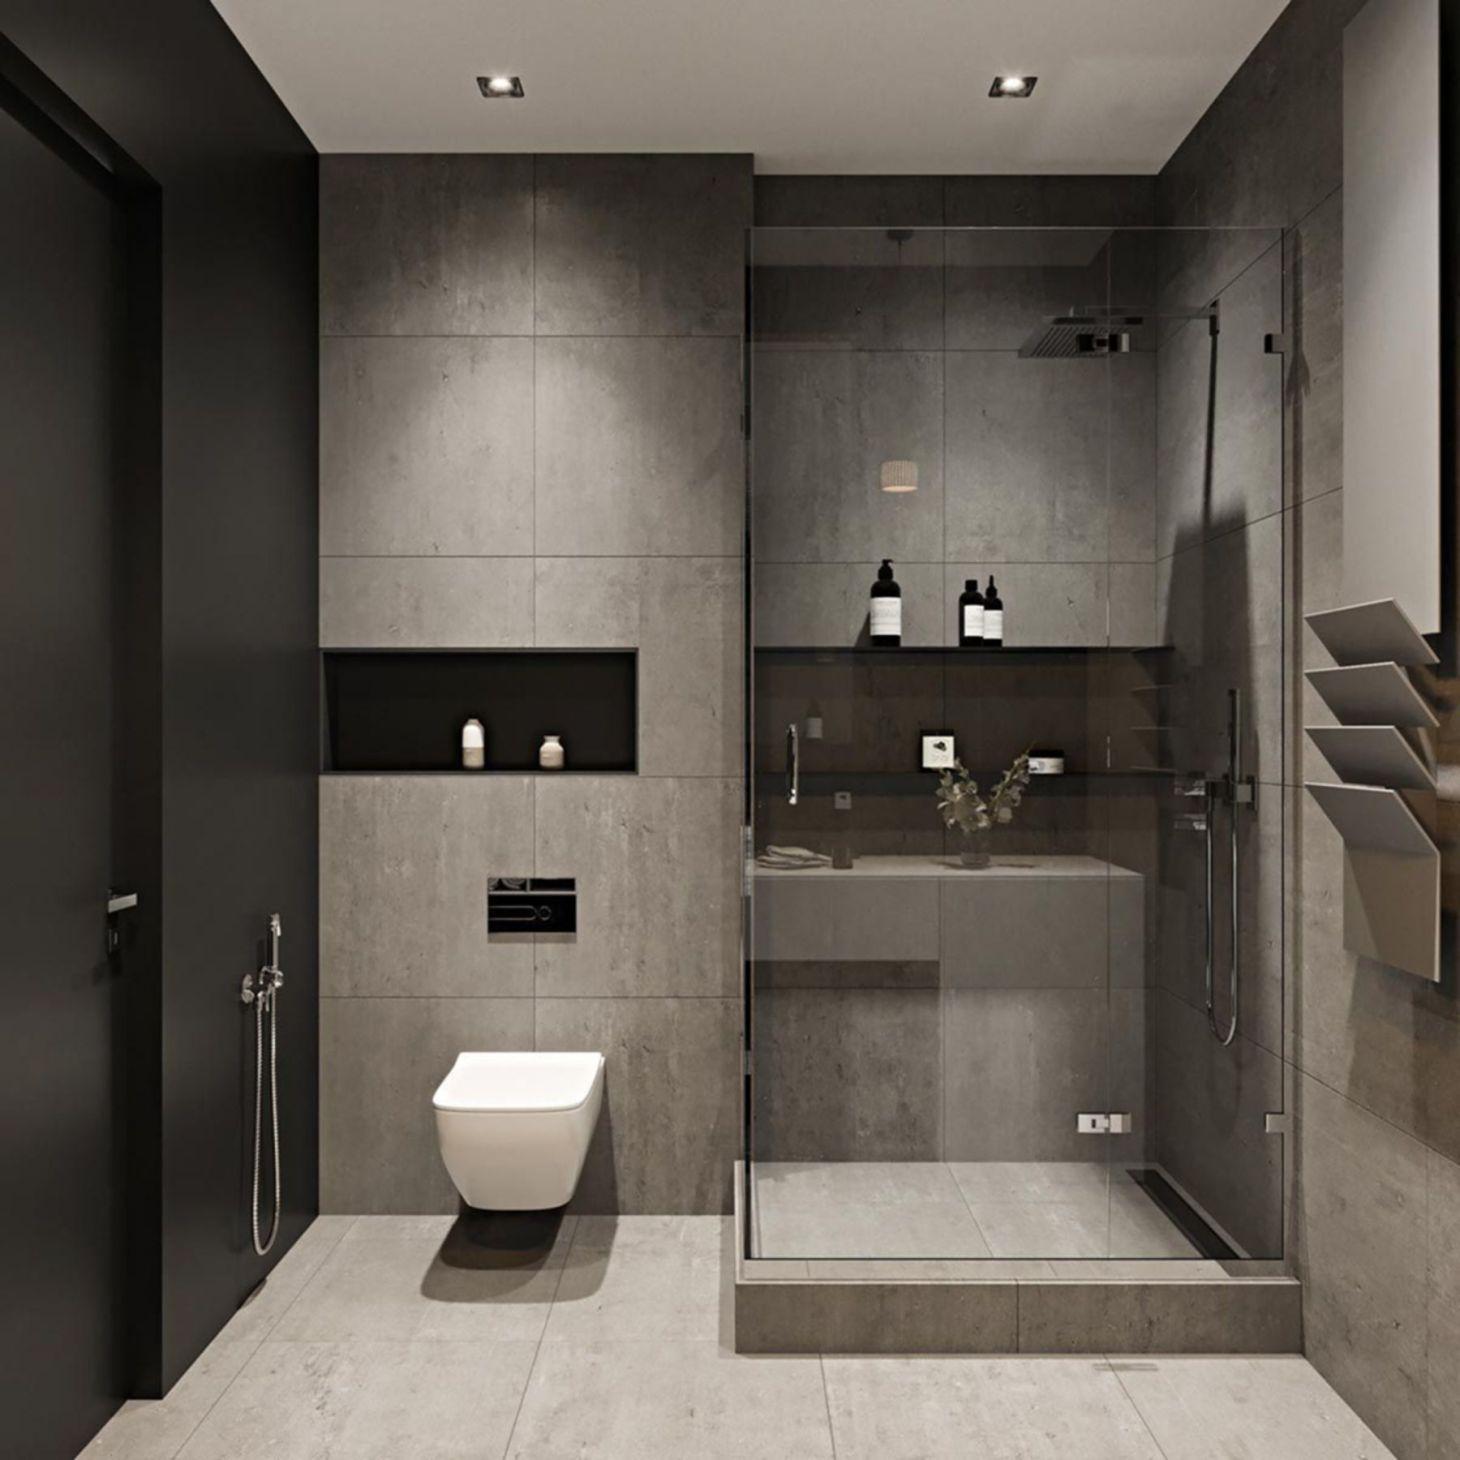 10 Incredible Small Bathroom Design Ideas For Trending 2019 Ideas Bathroom Remodel Cost Tile Bathroom Bathroom Design Small